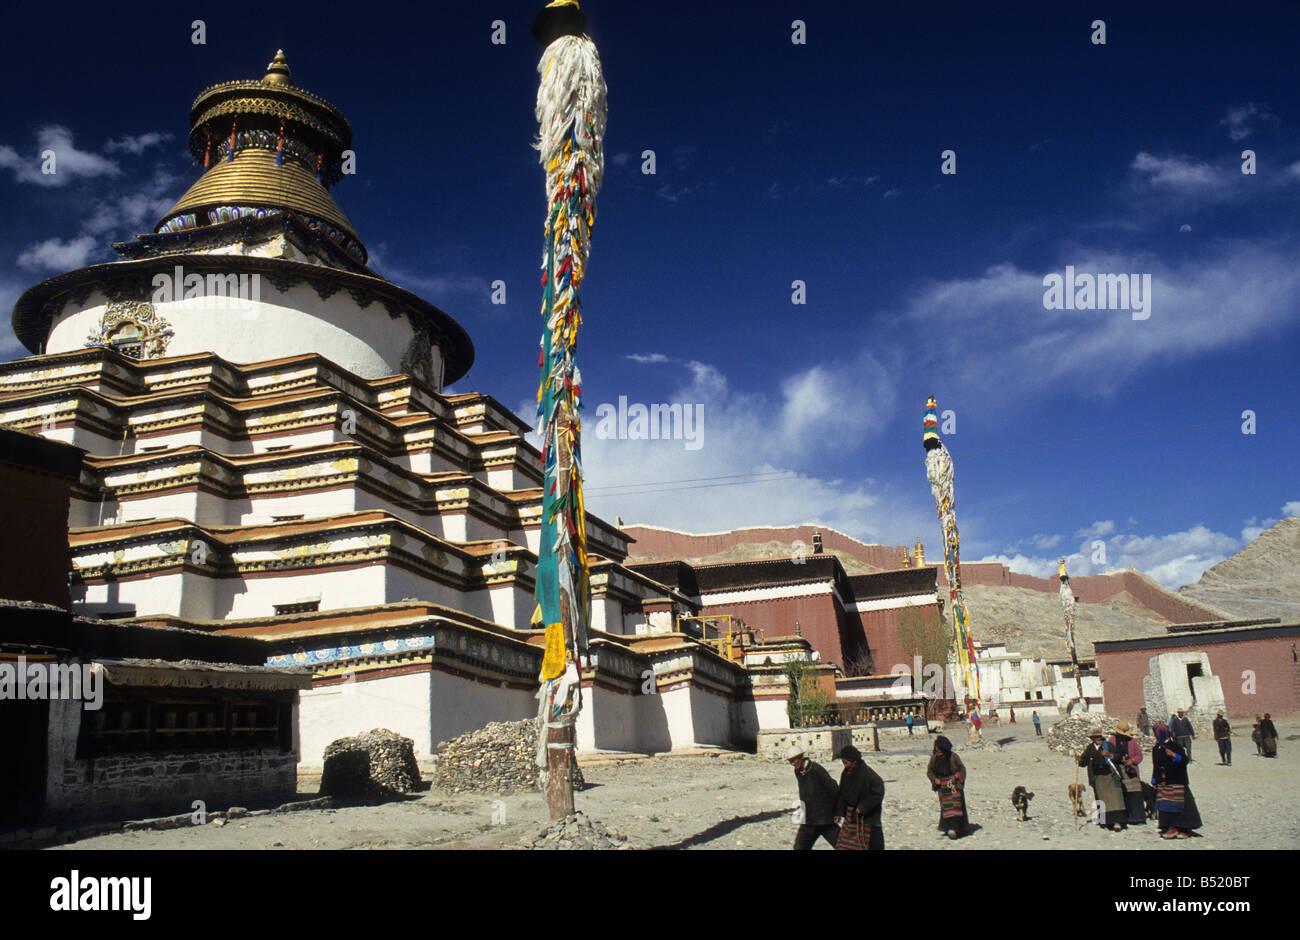 Asia, China, Tibet - Stock Image